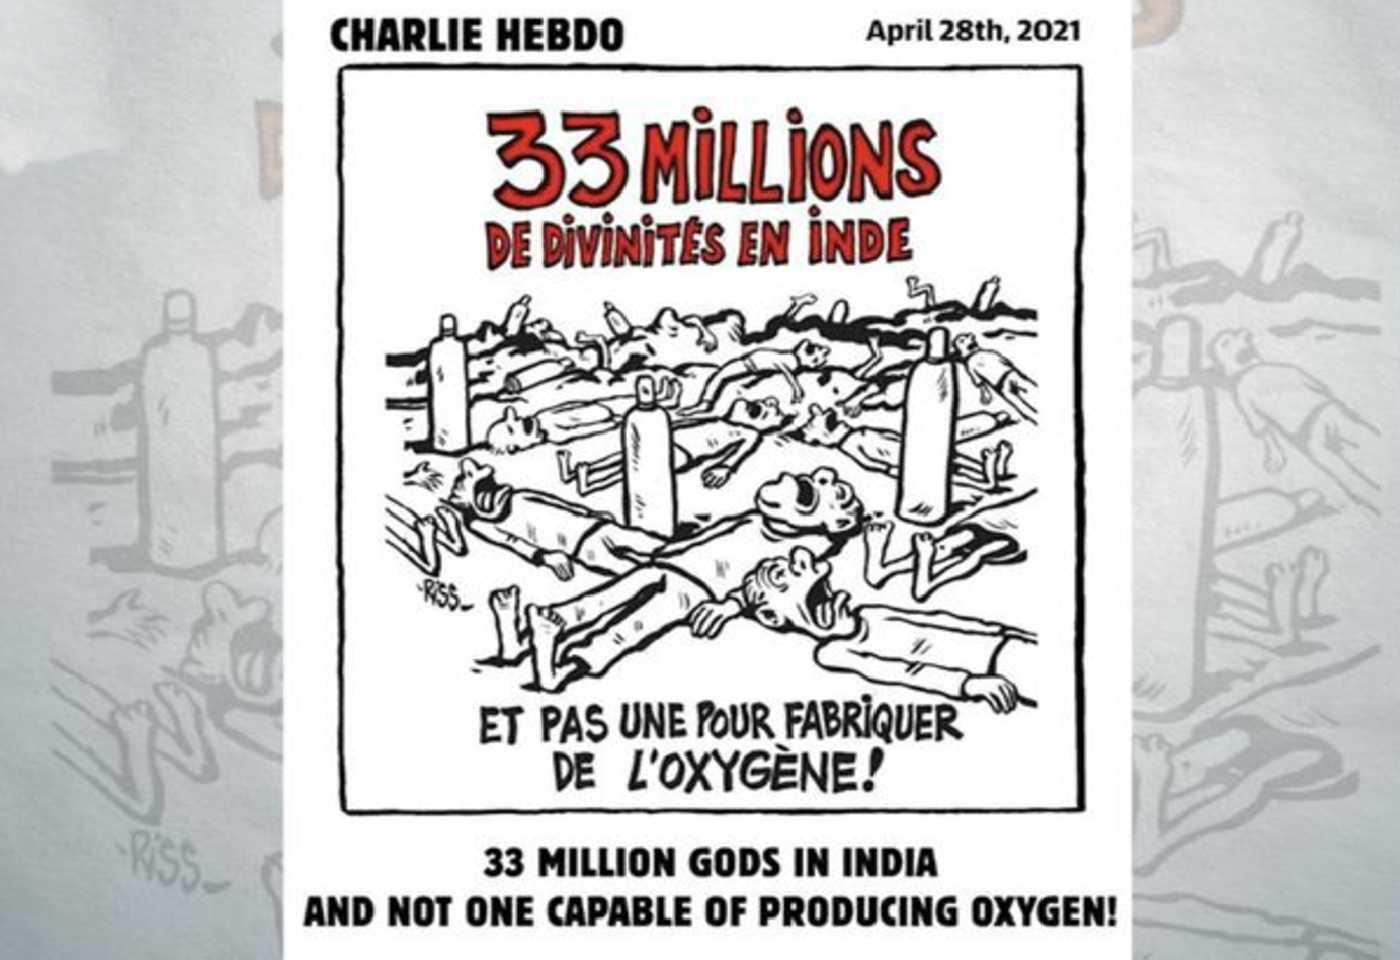 Controversial French Cartoon Magazine Charlie Hebdo Cartoon on Indias Oxygen Shortage making Fun Of Hindu Gods